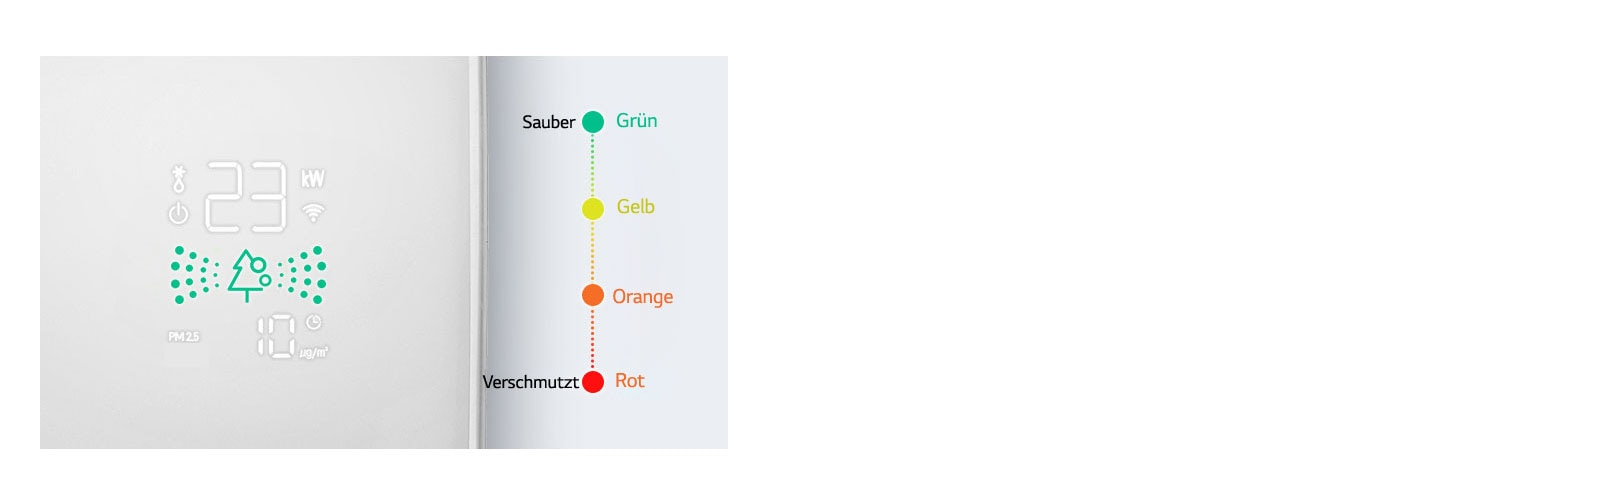 4-Farben Smart Display1